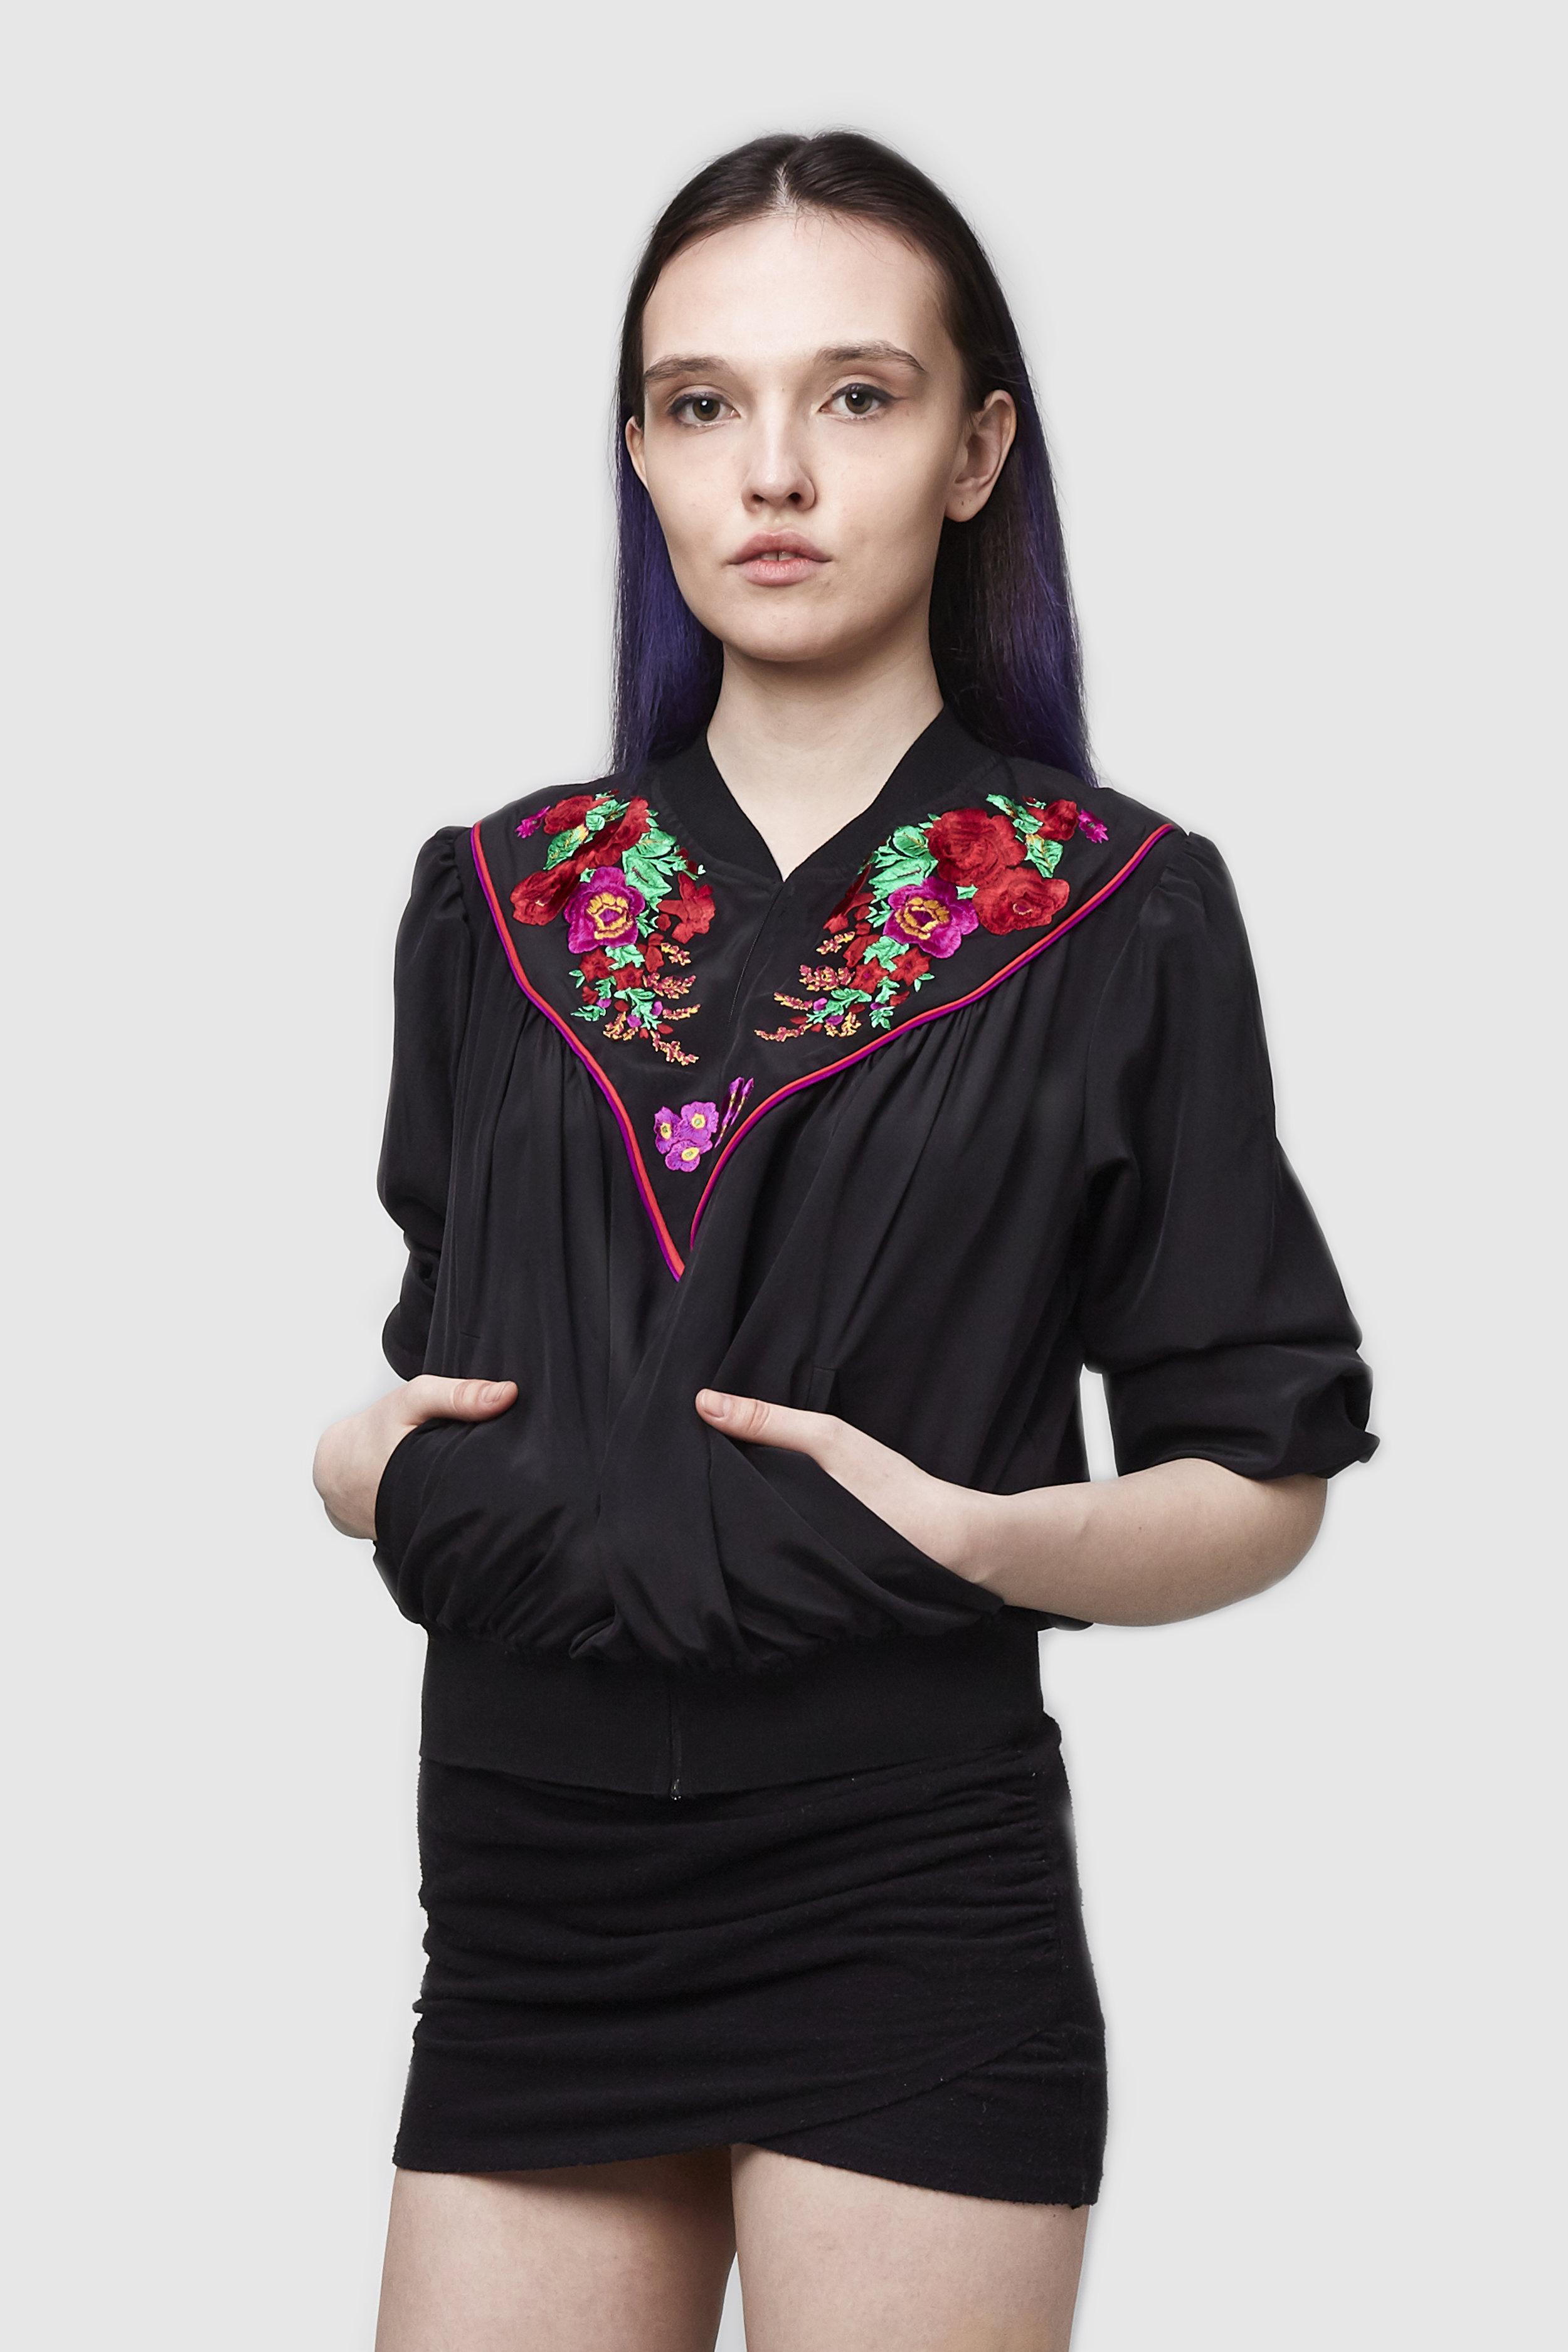 - The Babushka Scarf Embroidered Silk Bomber